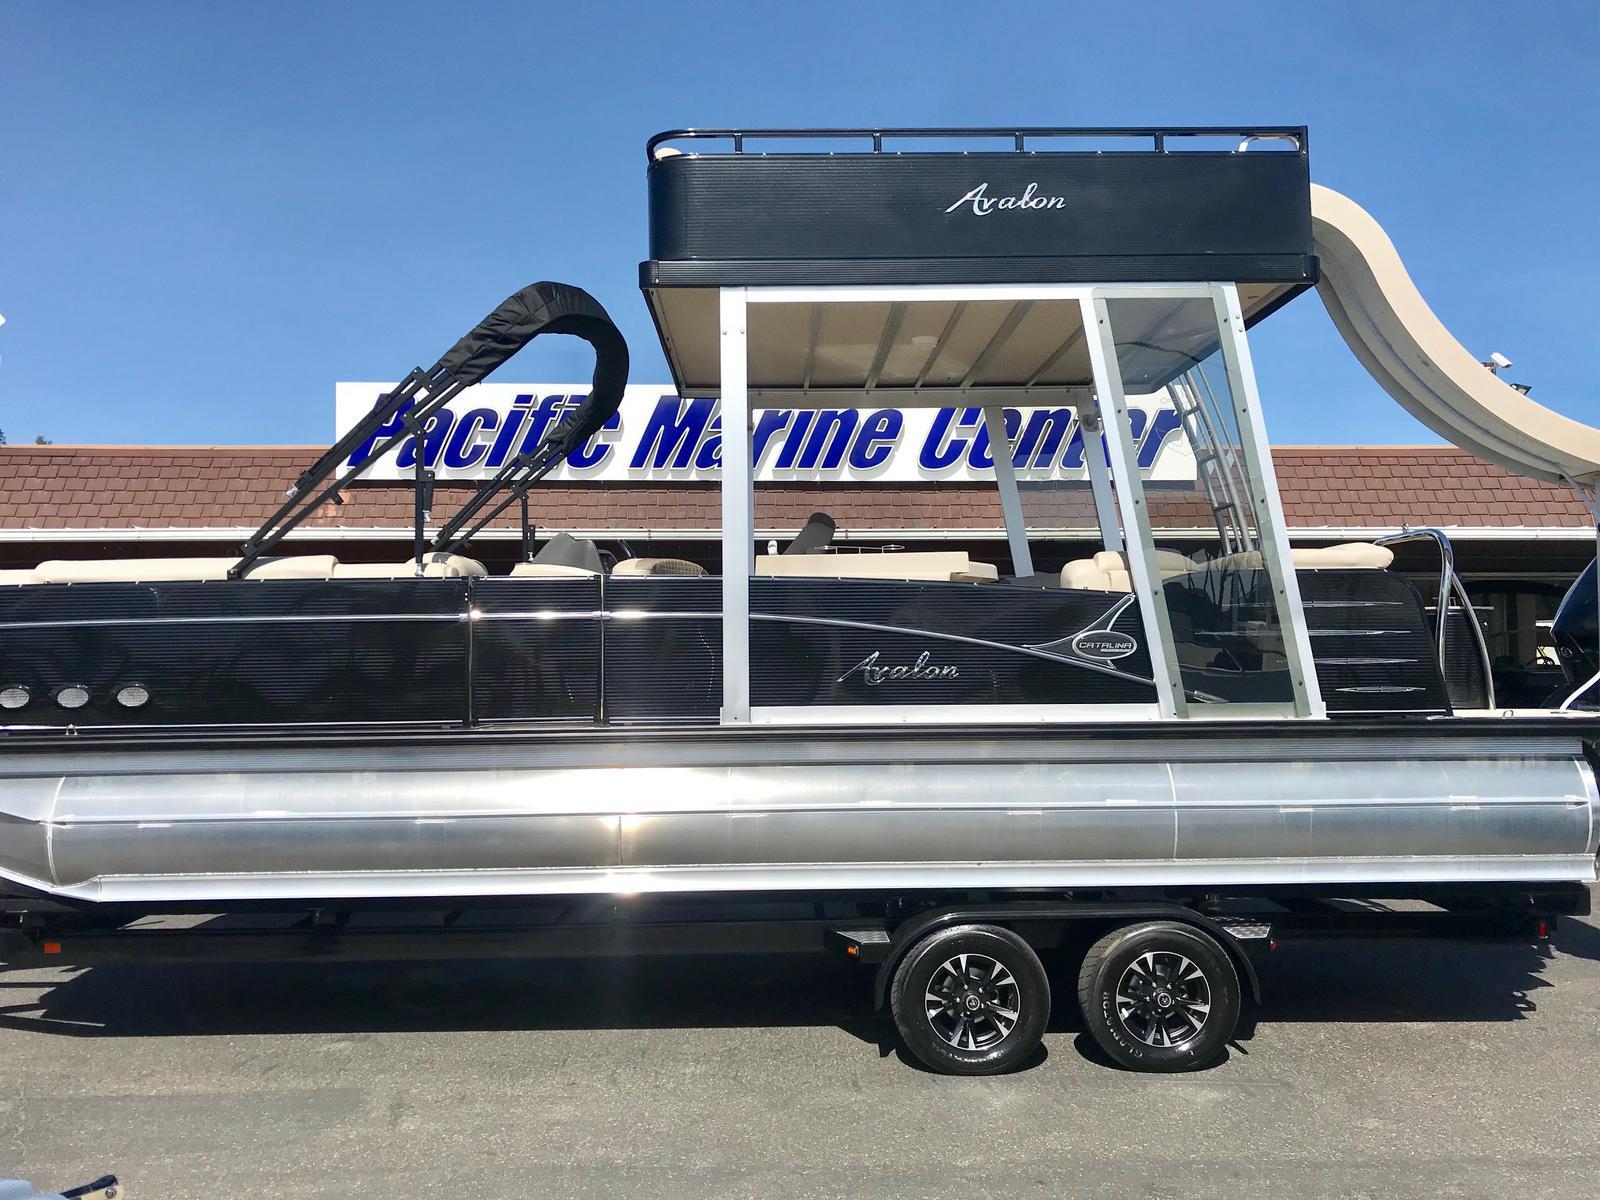 Avalon Catalina Platinum Entertainer Funship 27' w/ 250HP Mercury 4 Stroke Verado!